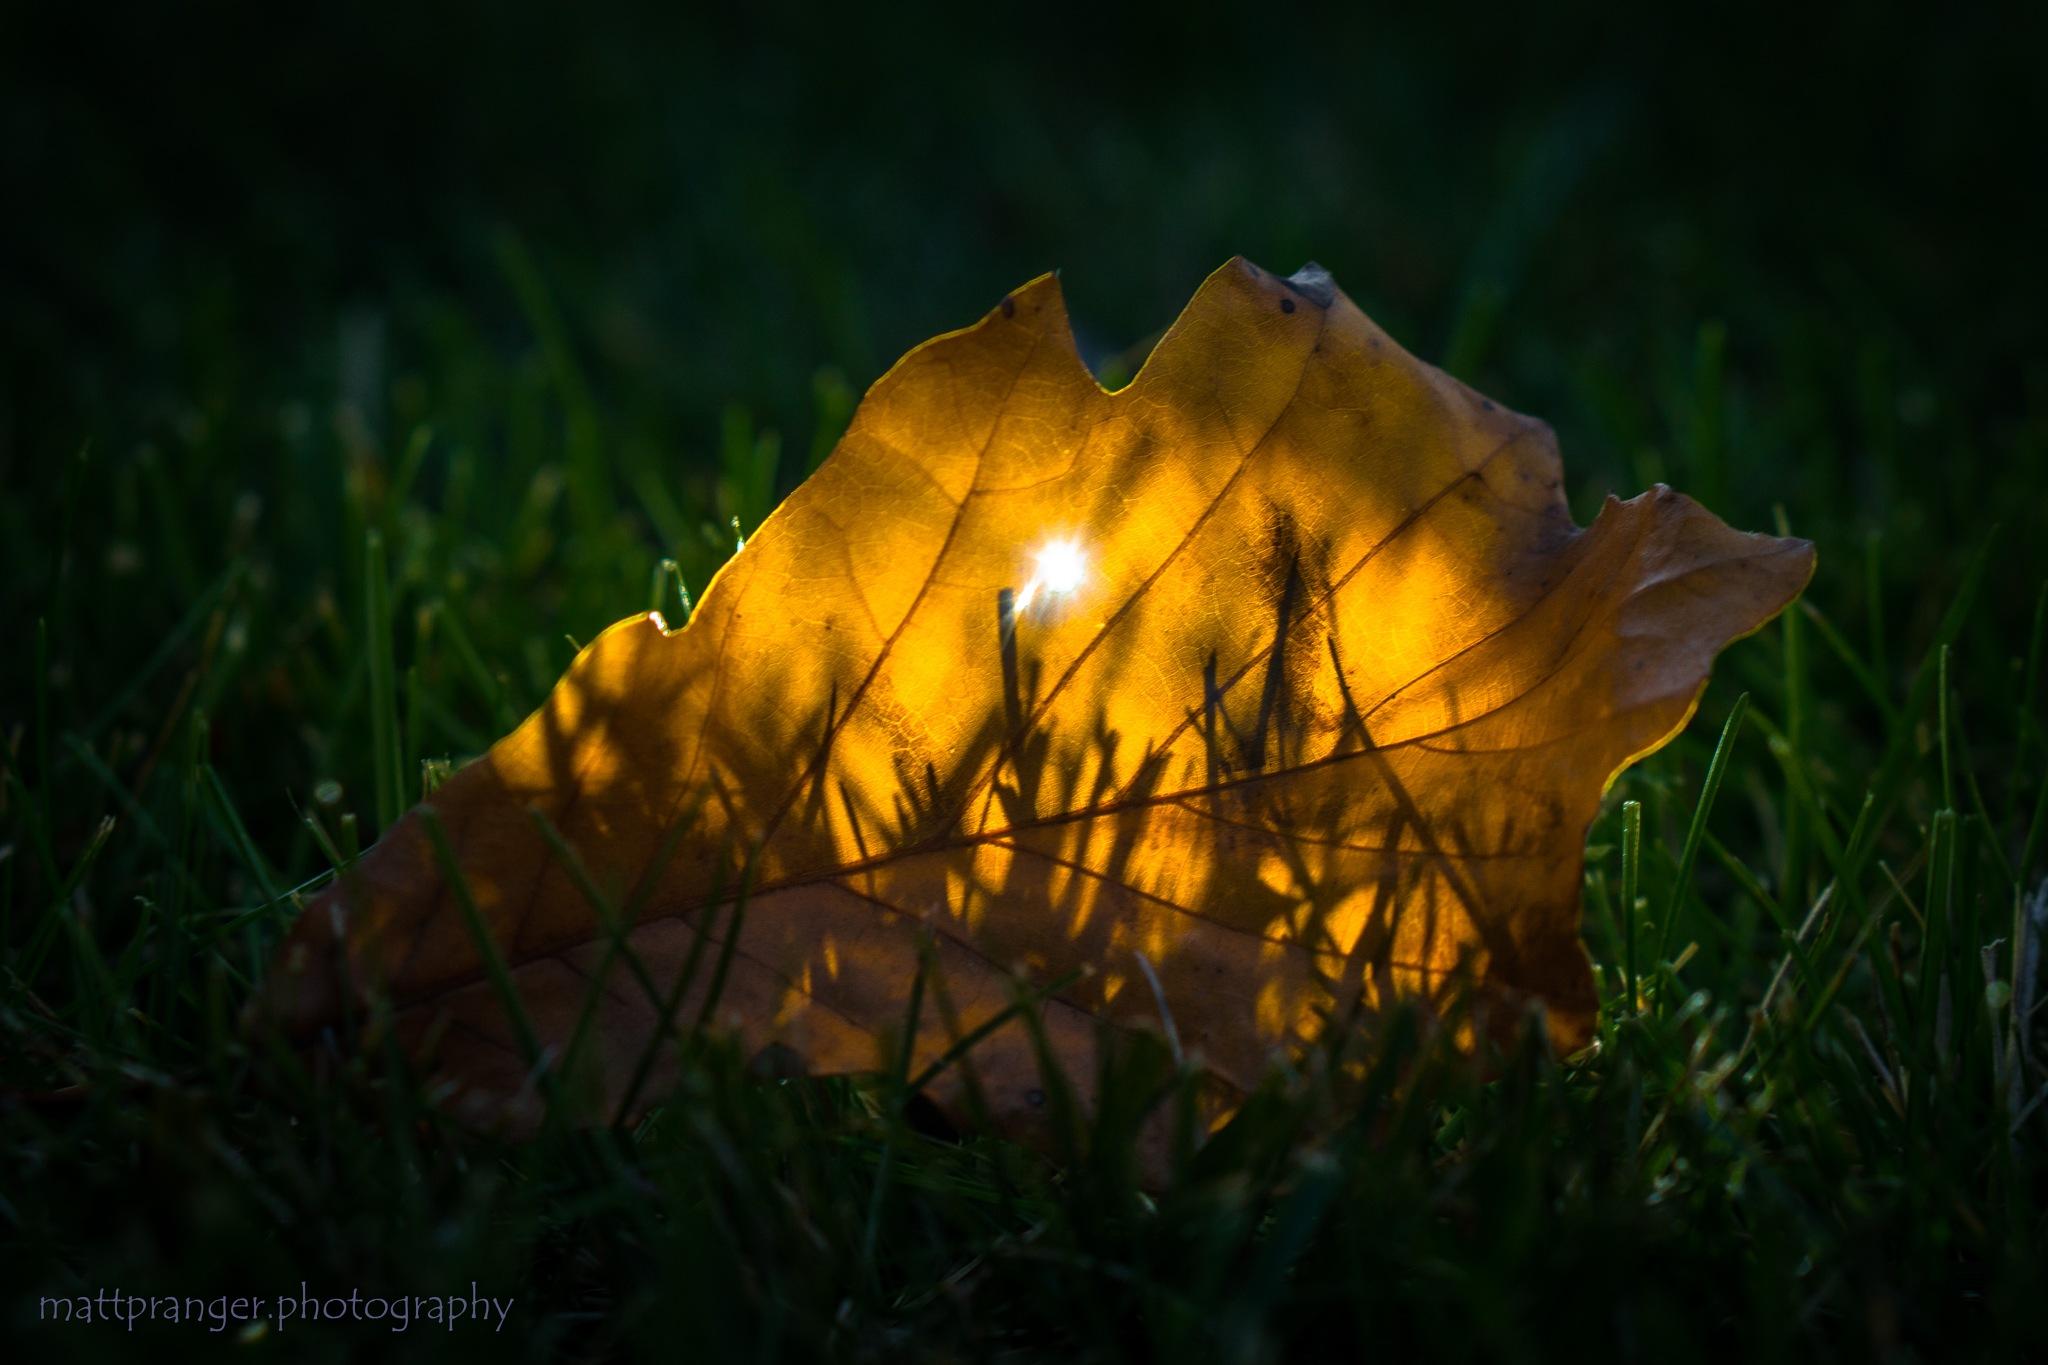 Single Autumn Leaf by Matt Pranger